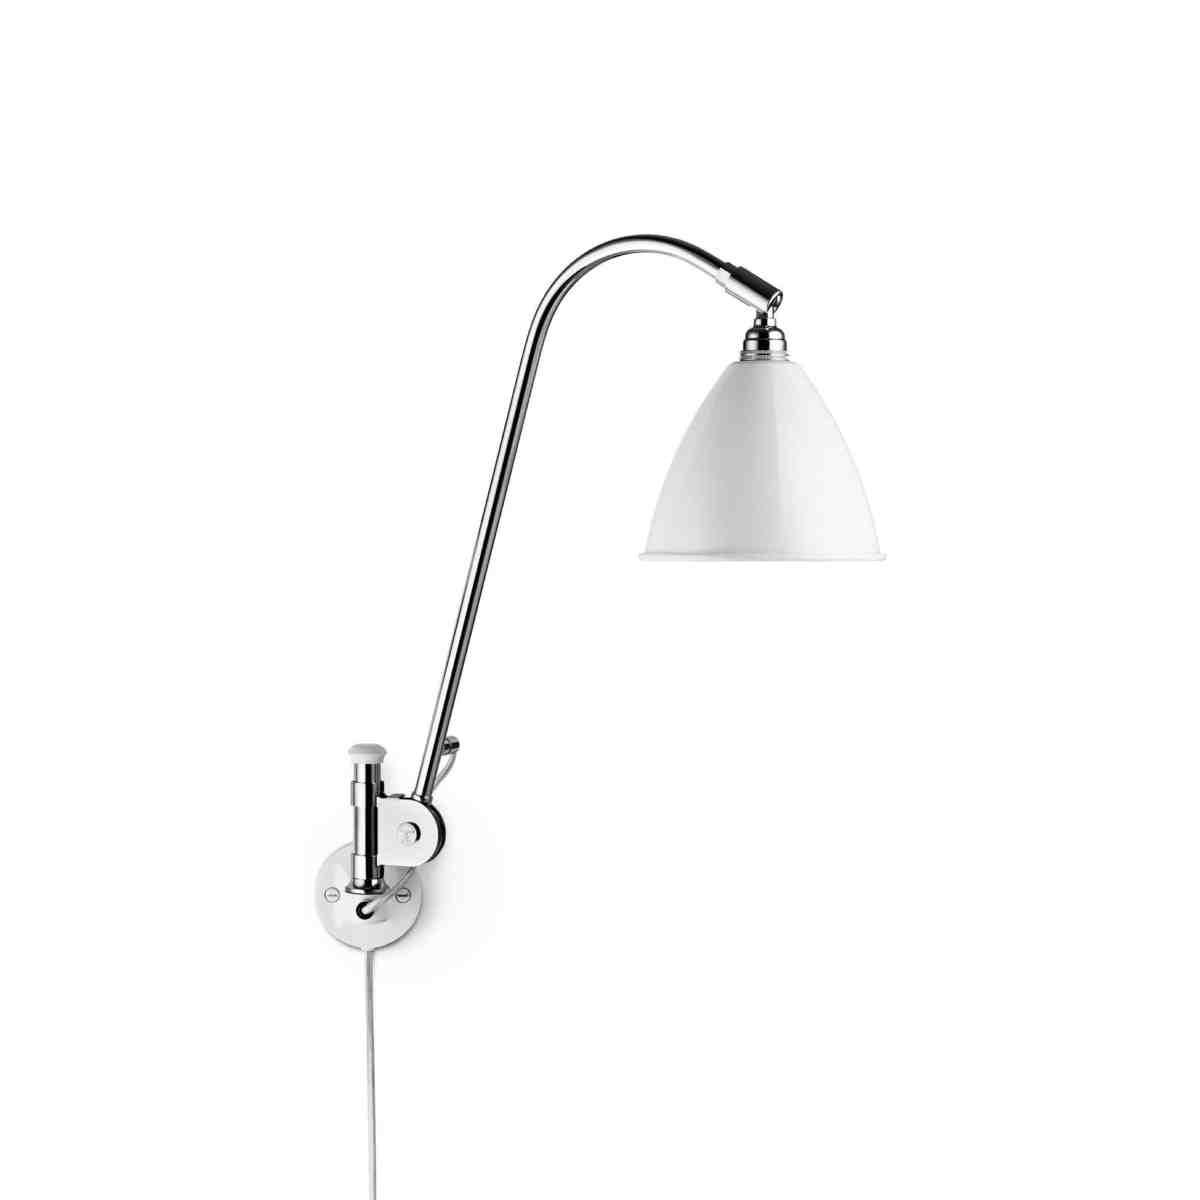 gubi-bestlite-wall-lamp-BL6-matt-white-chrome-01